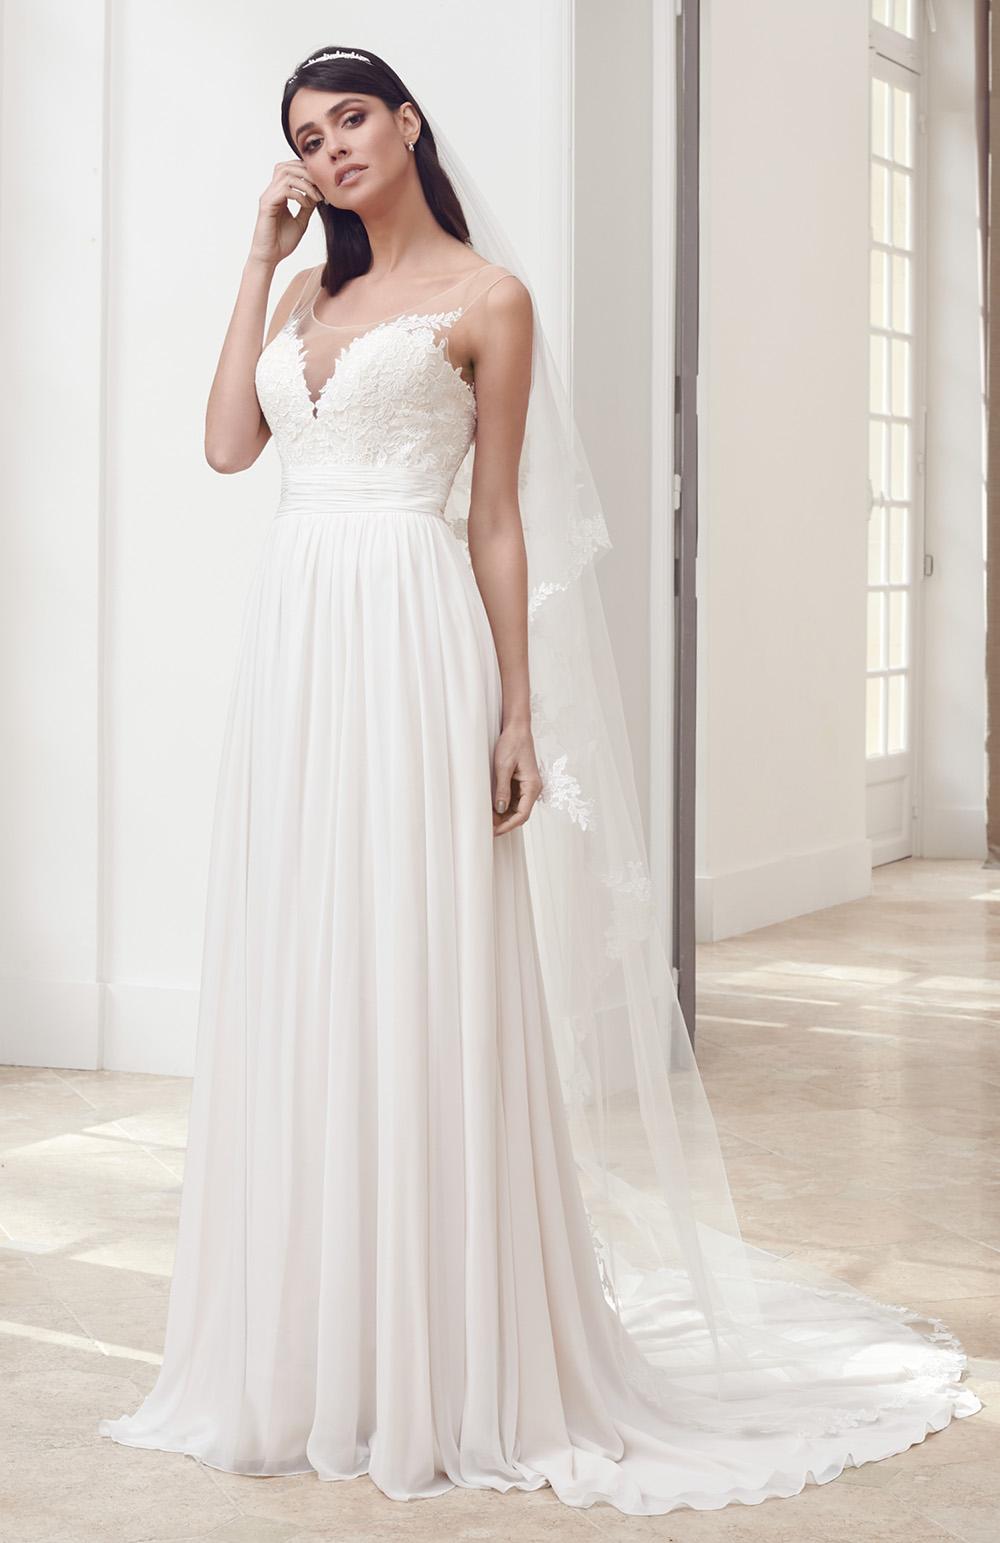 Robe de mariée Modèle Olivia